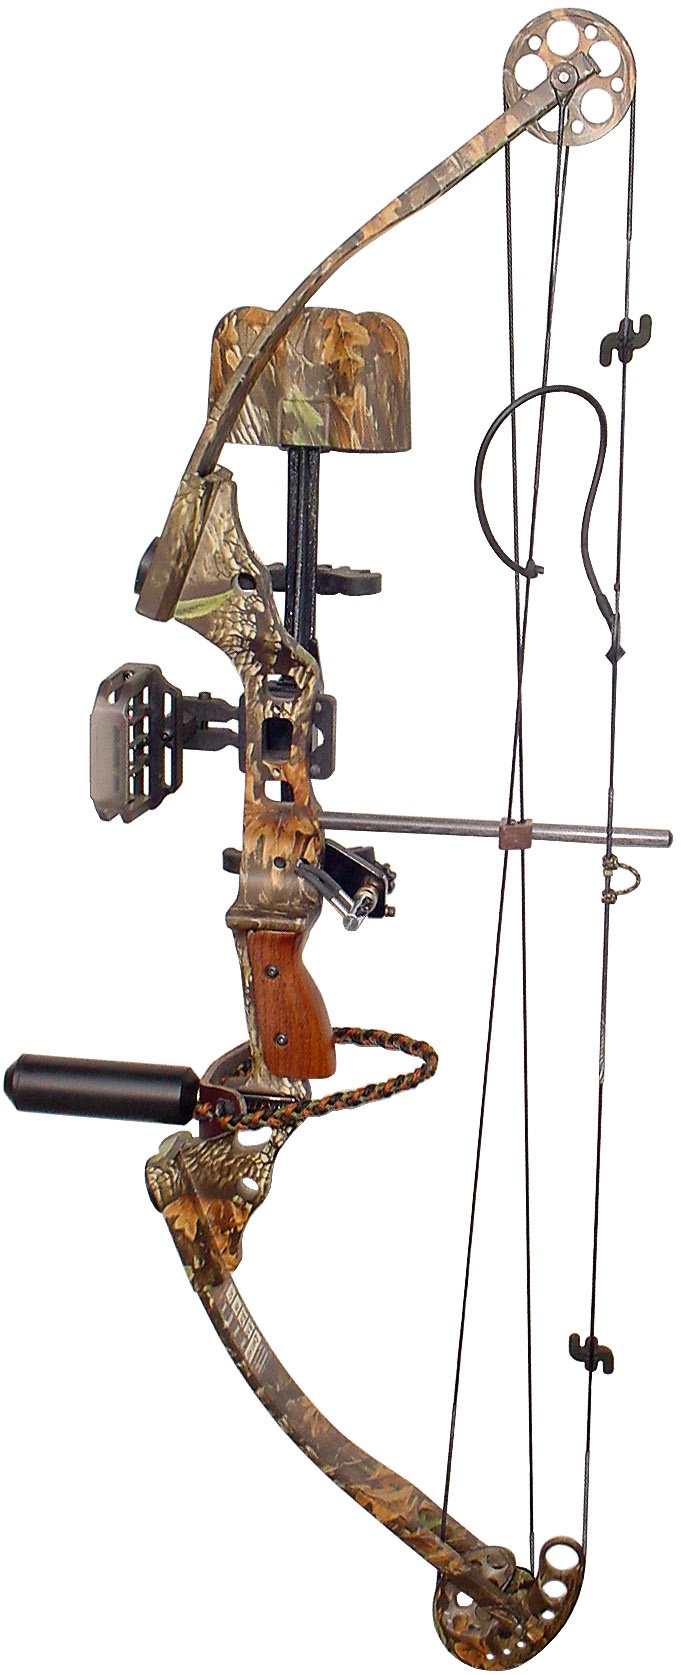 25 Best Archery